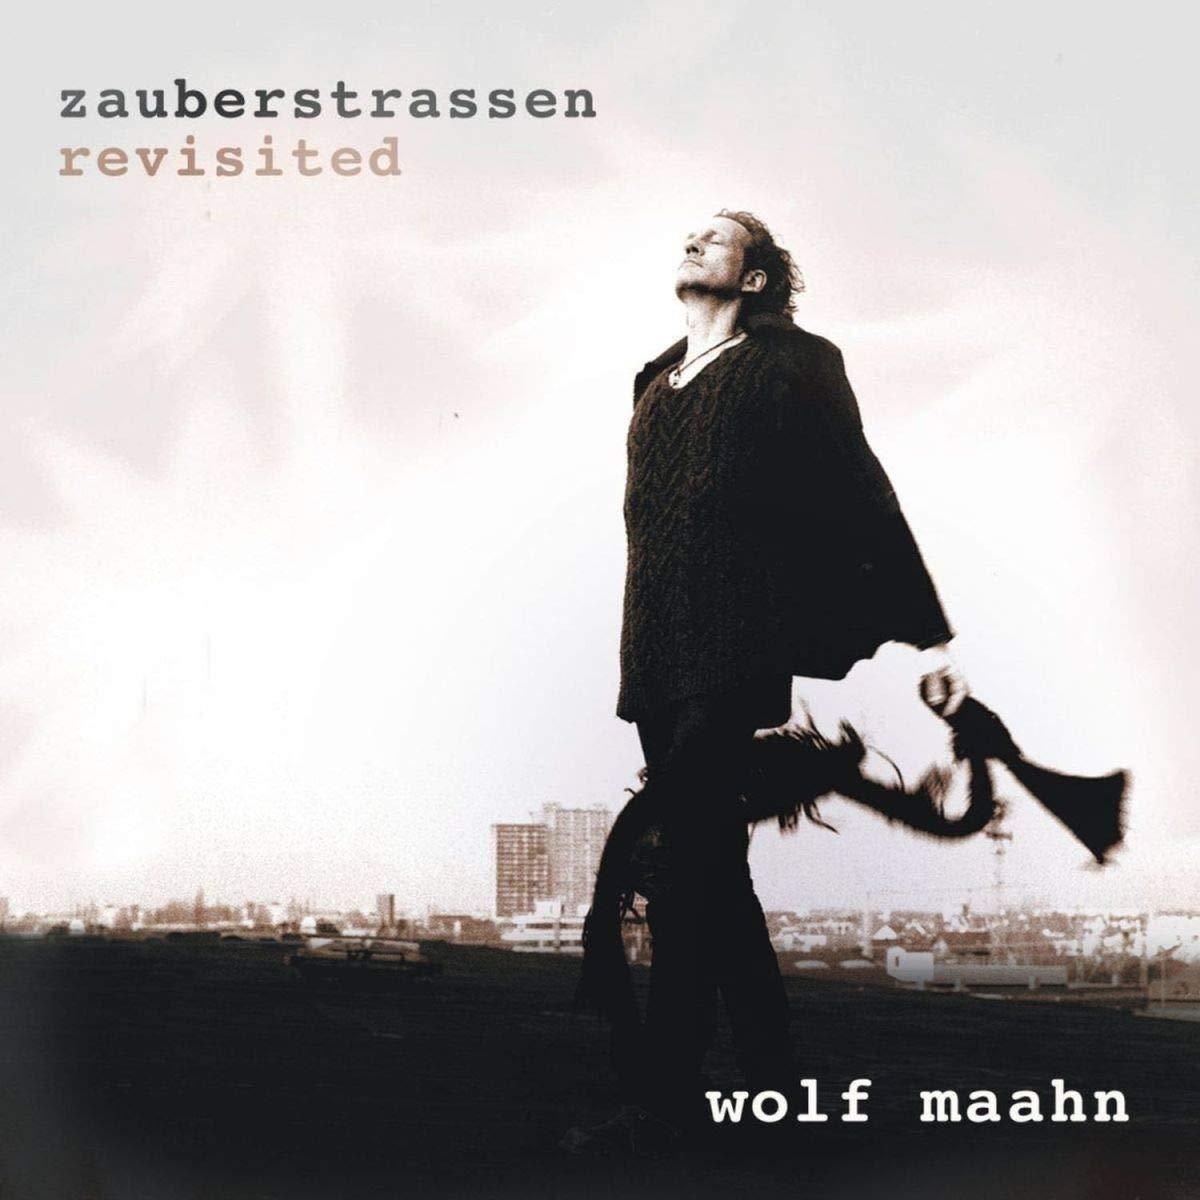 Zauberstrassen-Revisited - Wolf Maahn: Amazon.de: Musik